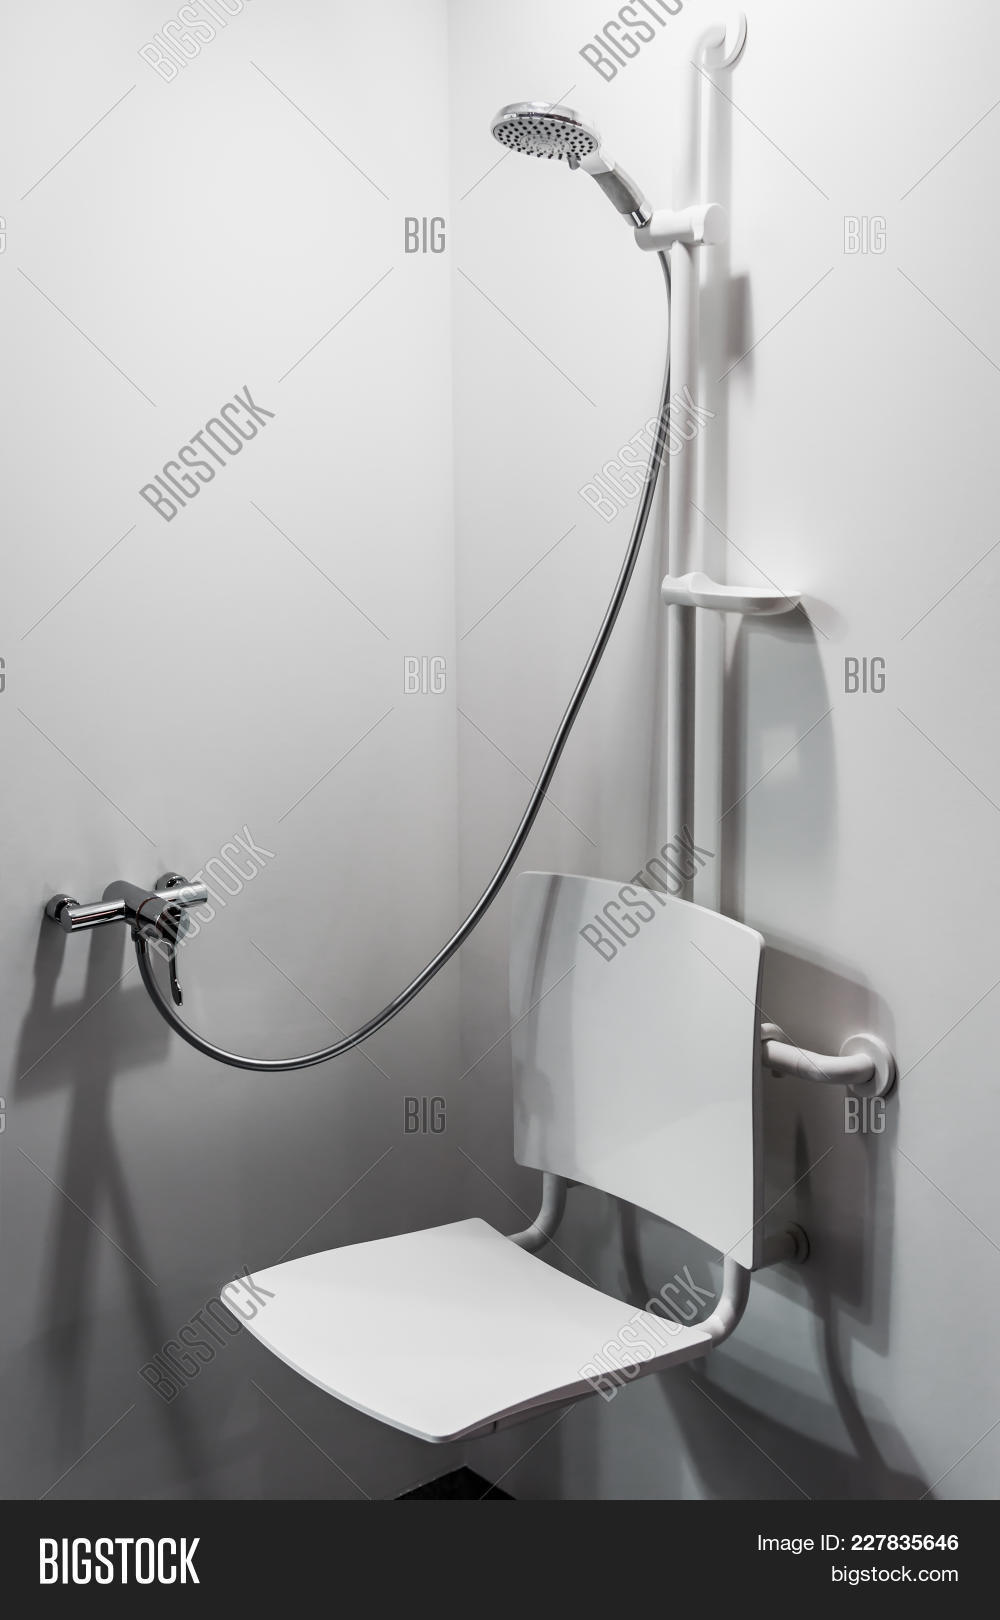 Shower Seat Grab Bars Image & Photo (Free Trial) | Bigstock